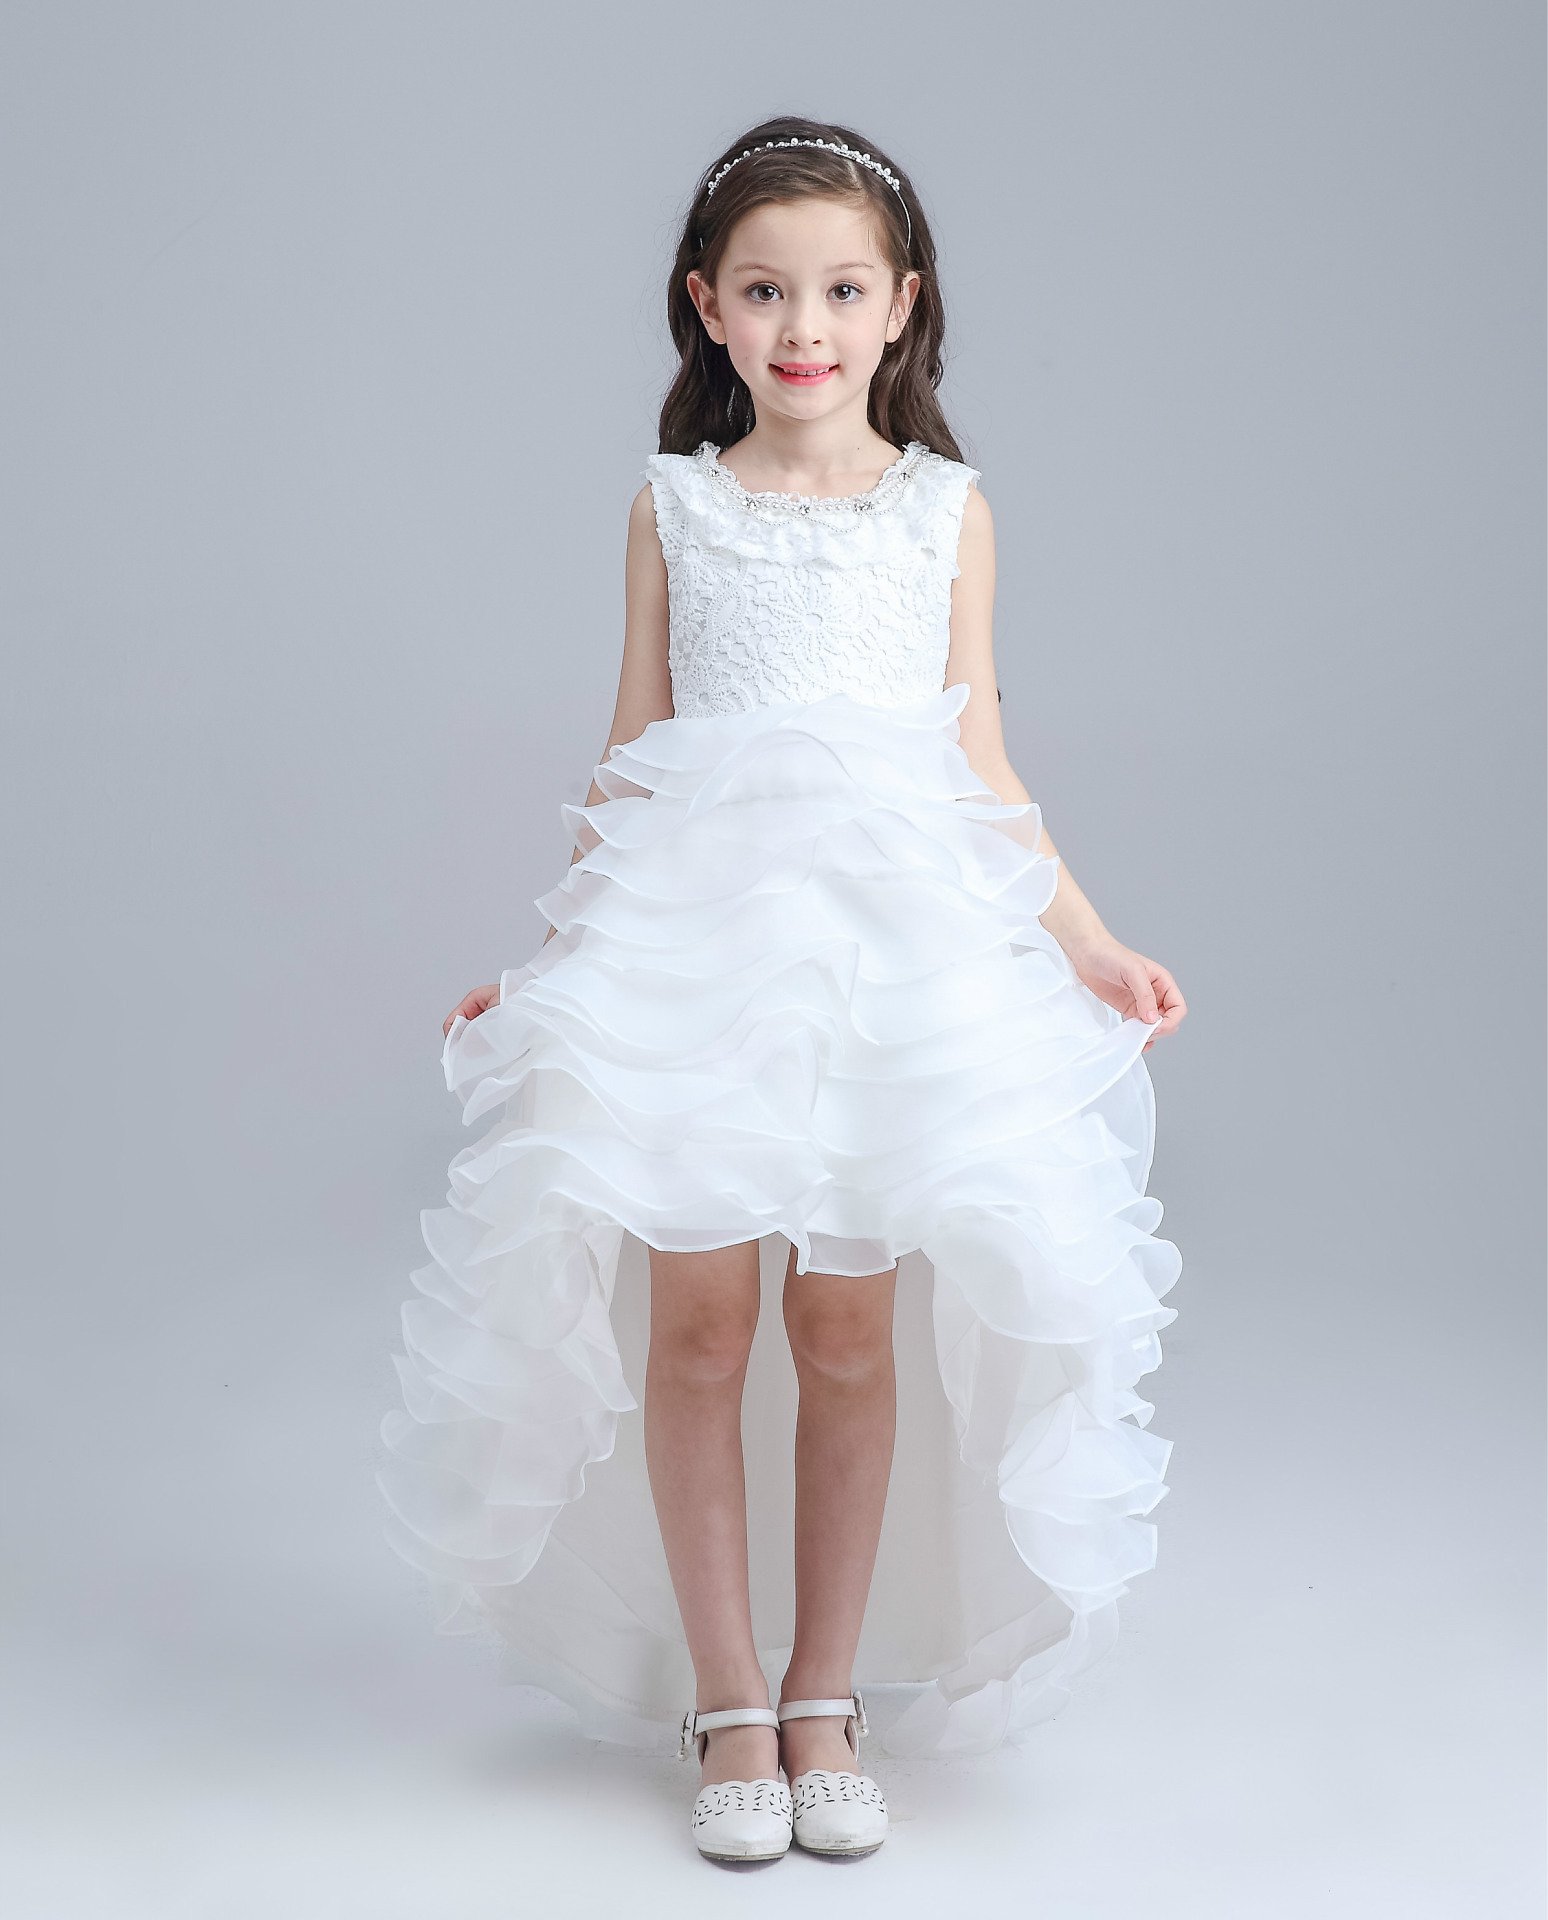 Aliexpress buy new red tailed girls dress princess wedding photos list ombrellifo Gallery